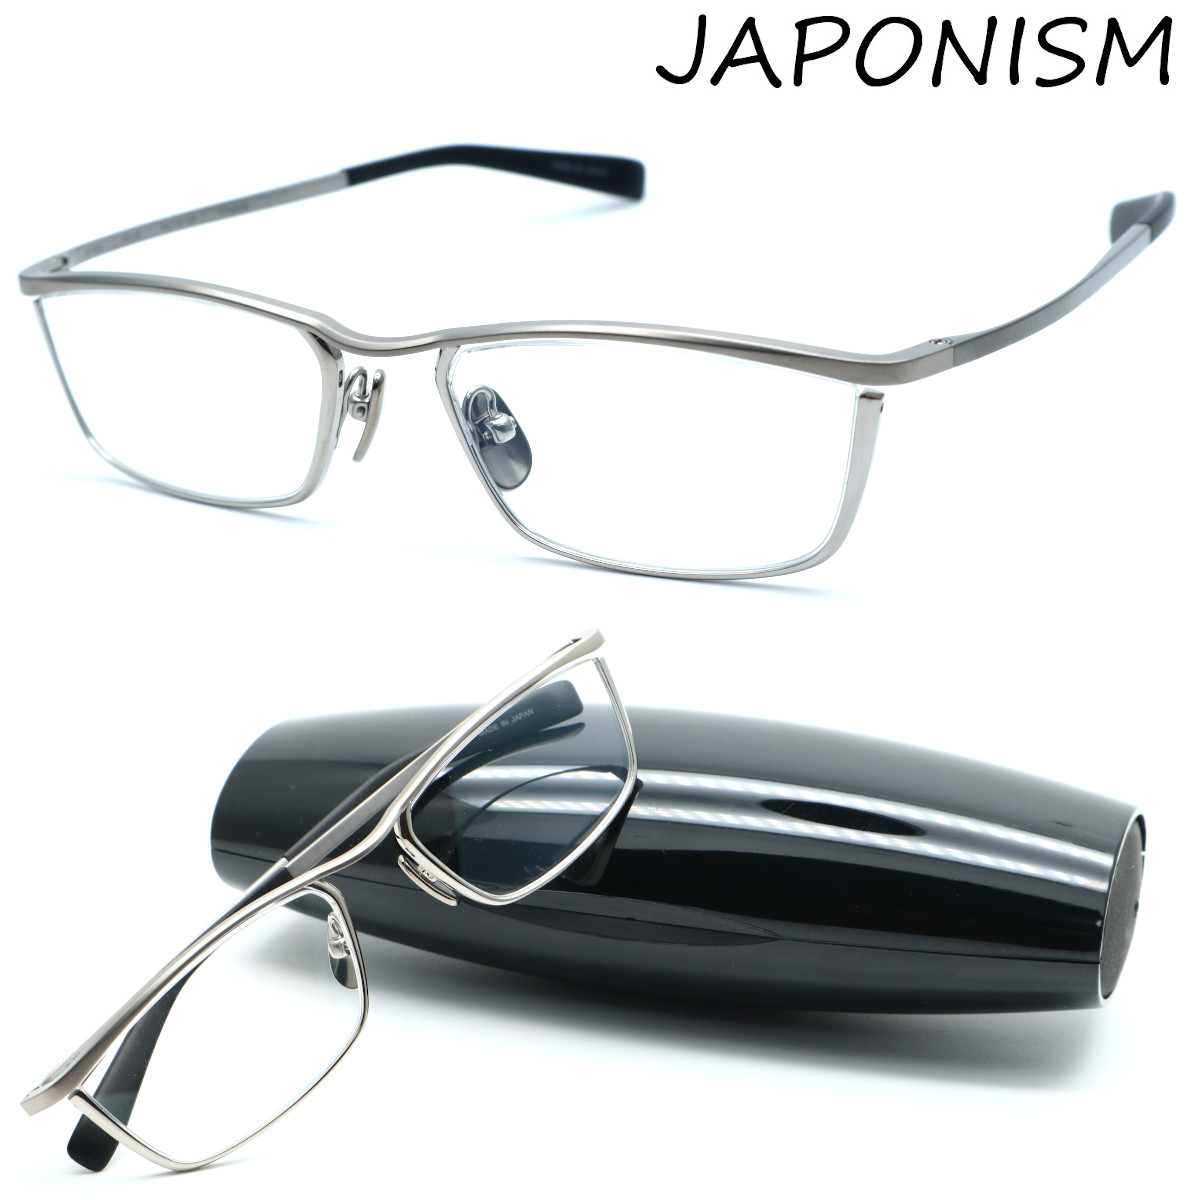 【JAPONISM】ジャポニズム メガネ JN-653 col.01 度付又は度無レンズ標準装備 MADE IN JAPAN【店内全品送料無料】